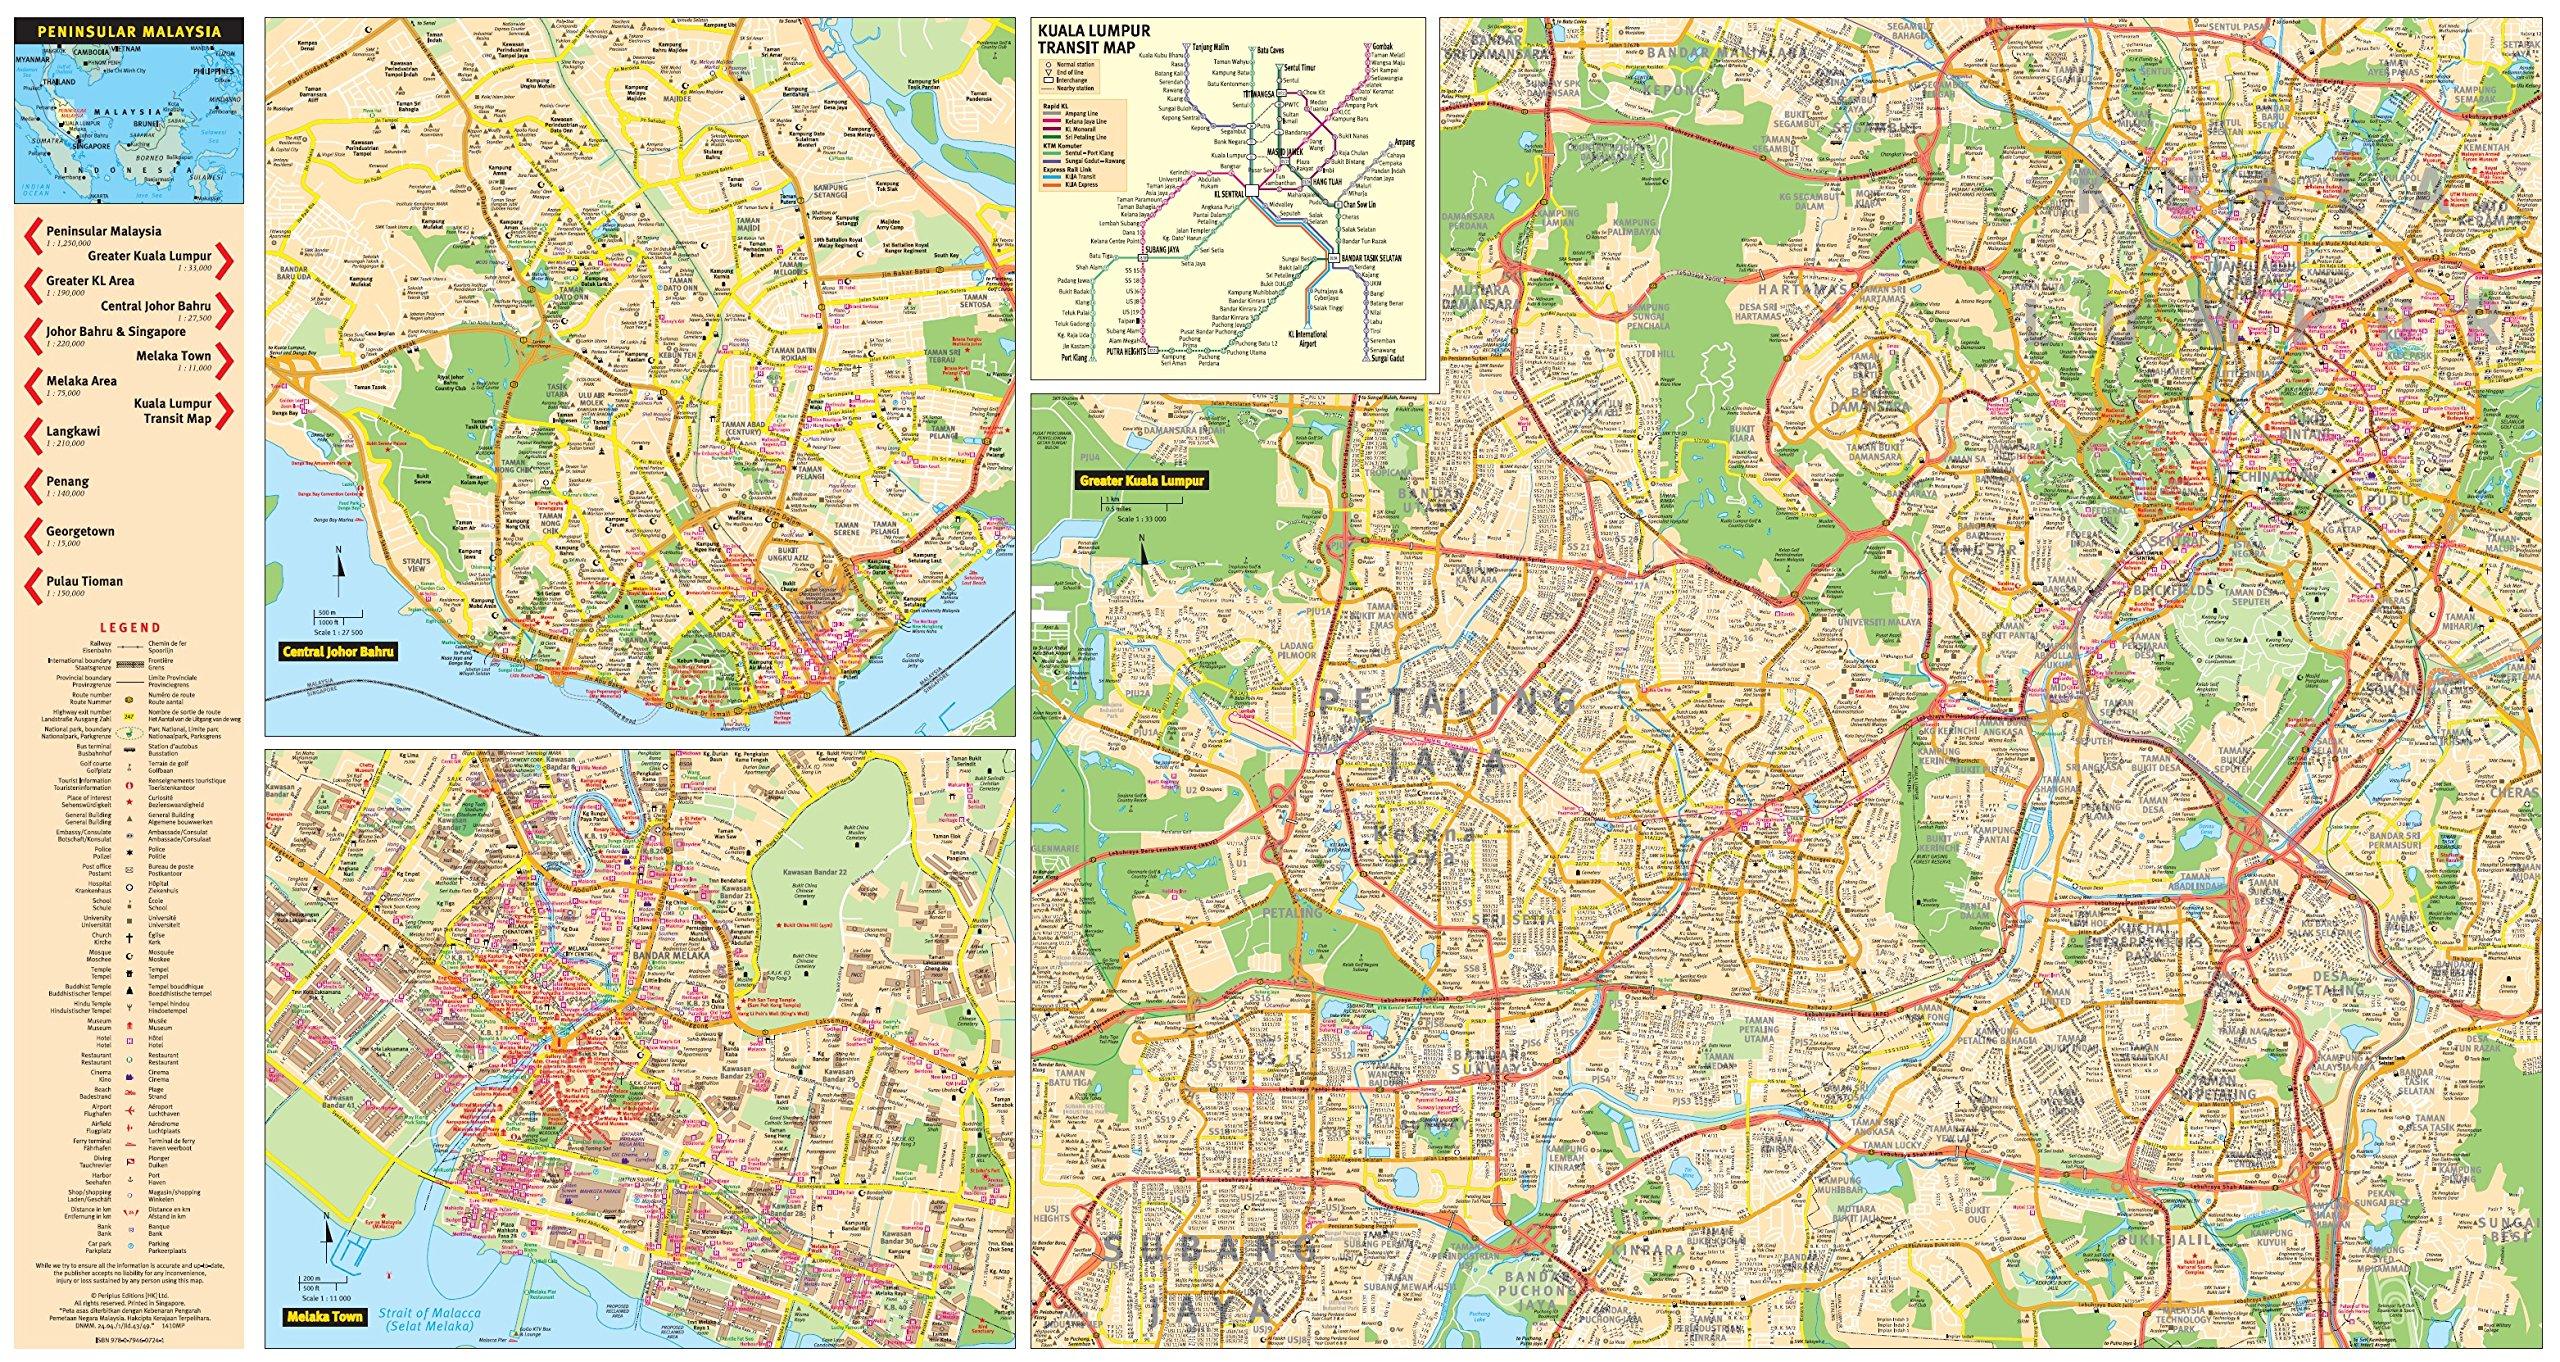 Peninsular Malaysia Travel Map Periplus Travel Maps Periplus